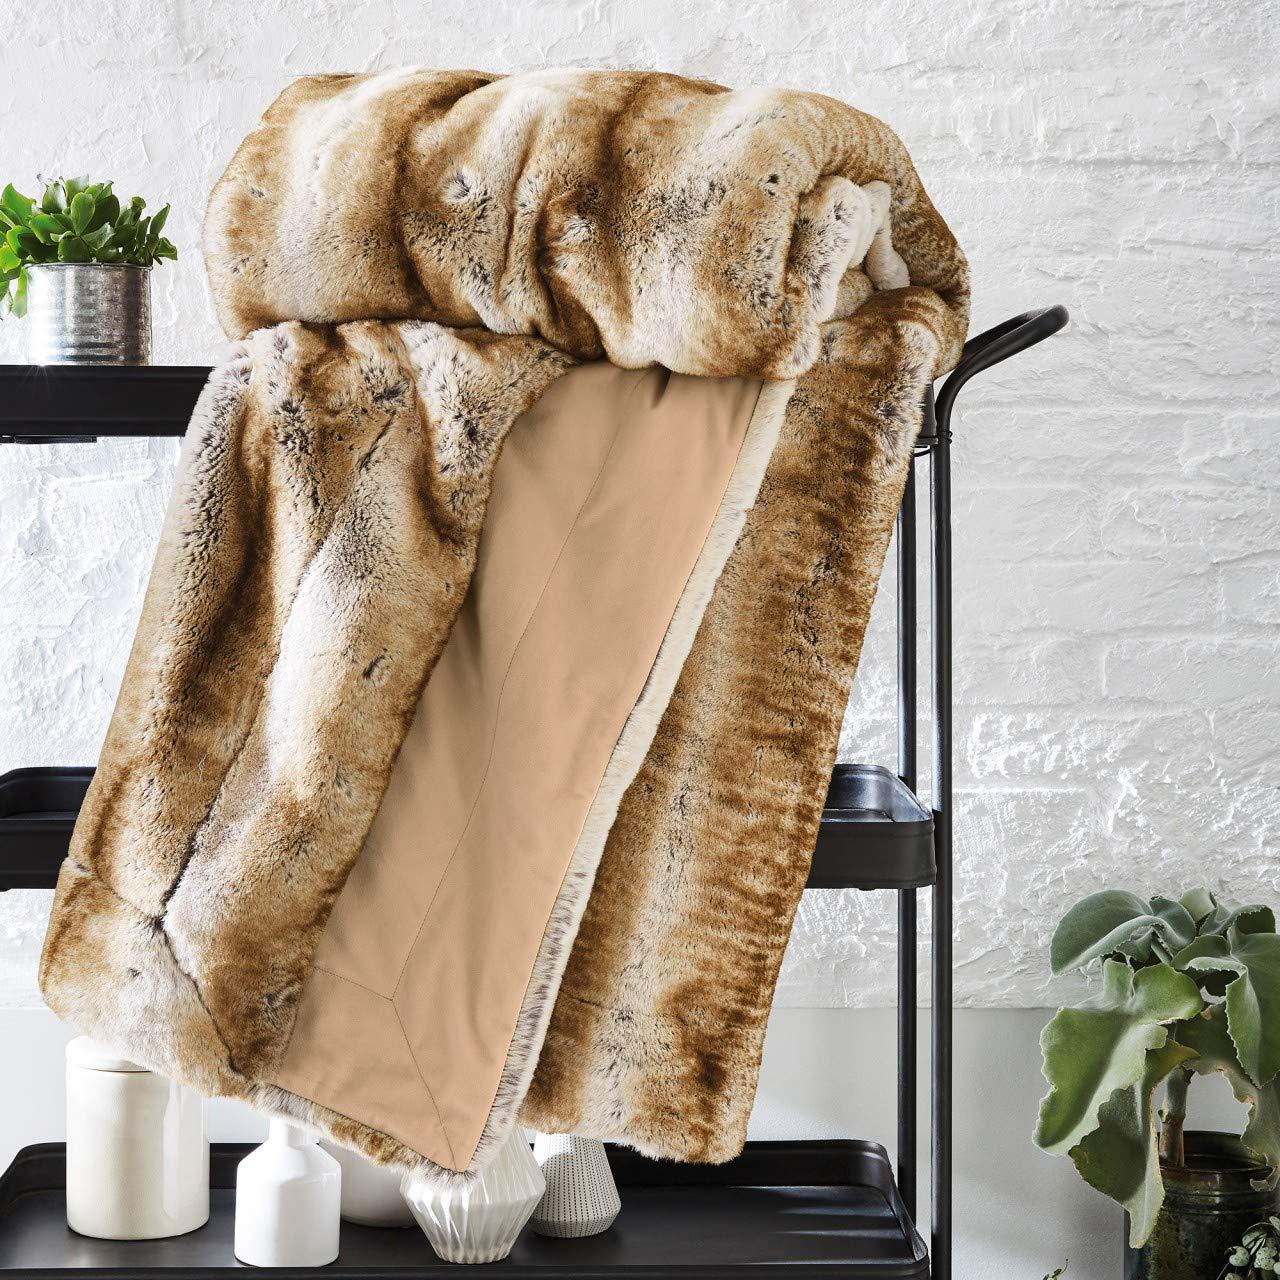 Bugatti Fellimitat Decke, Kuscheldecke aus hochwetigem Fellimitat beige, Sofadecke in edeler Felloptik 150x200 cm, Extra weiche und angenehm wärmende Kunstfelldecke, edele Tagesdecke